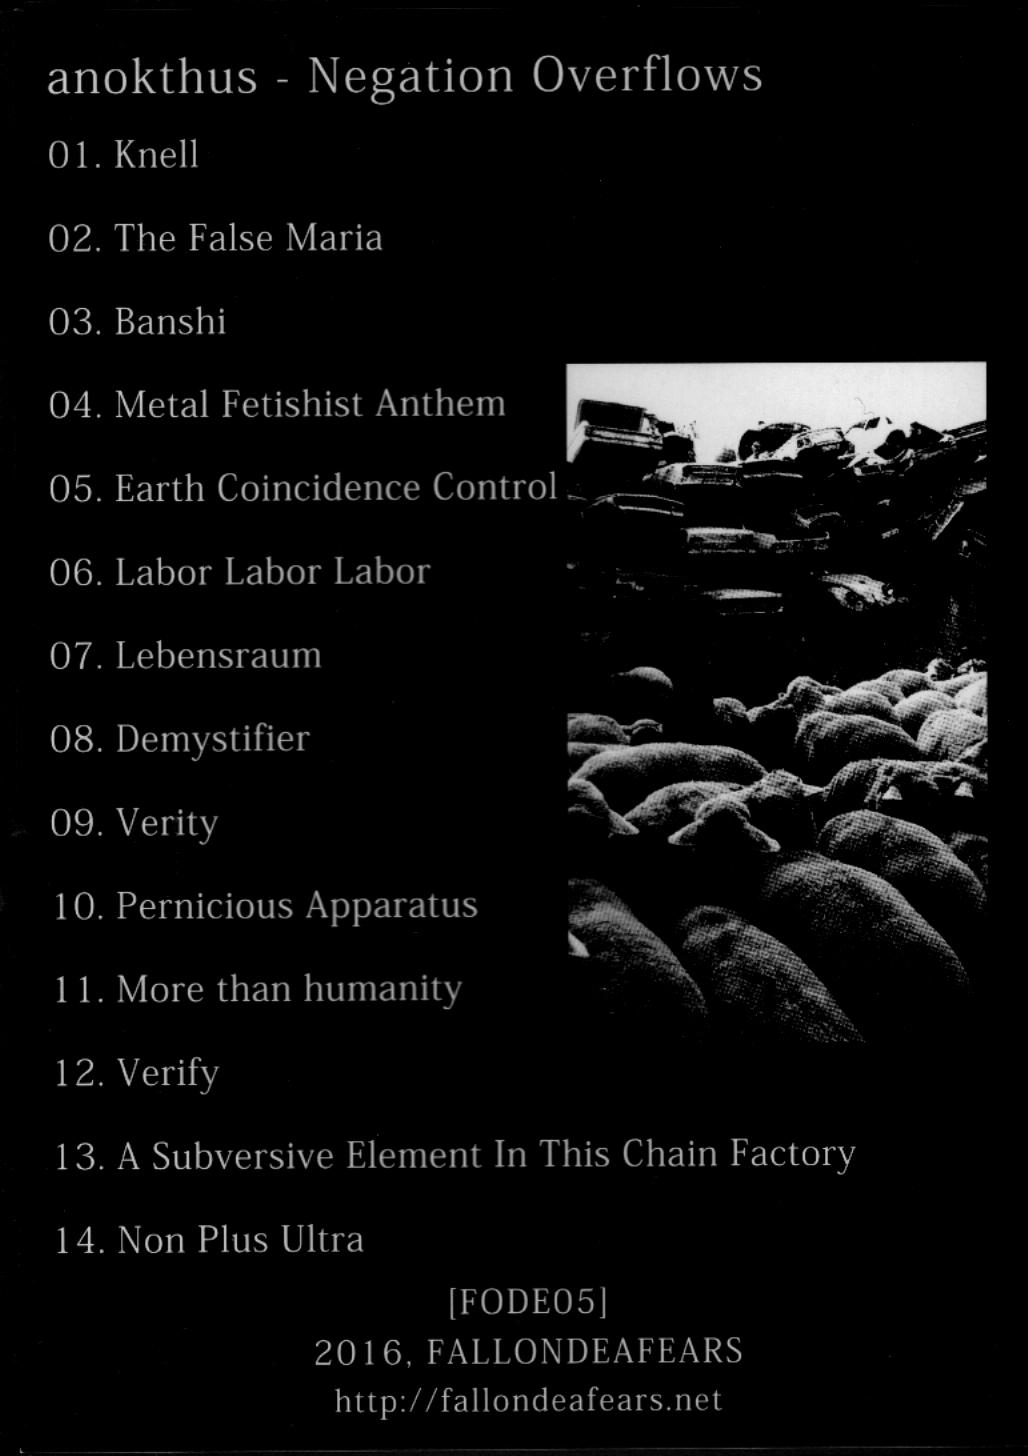 Anokthus - Negation Overflows  CD - 画像2